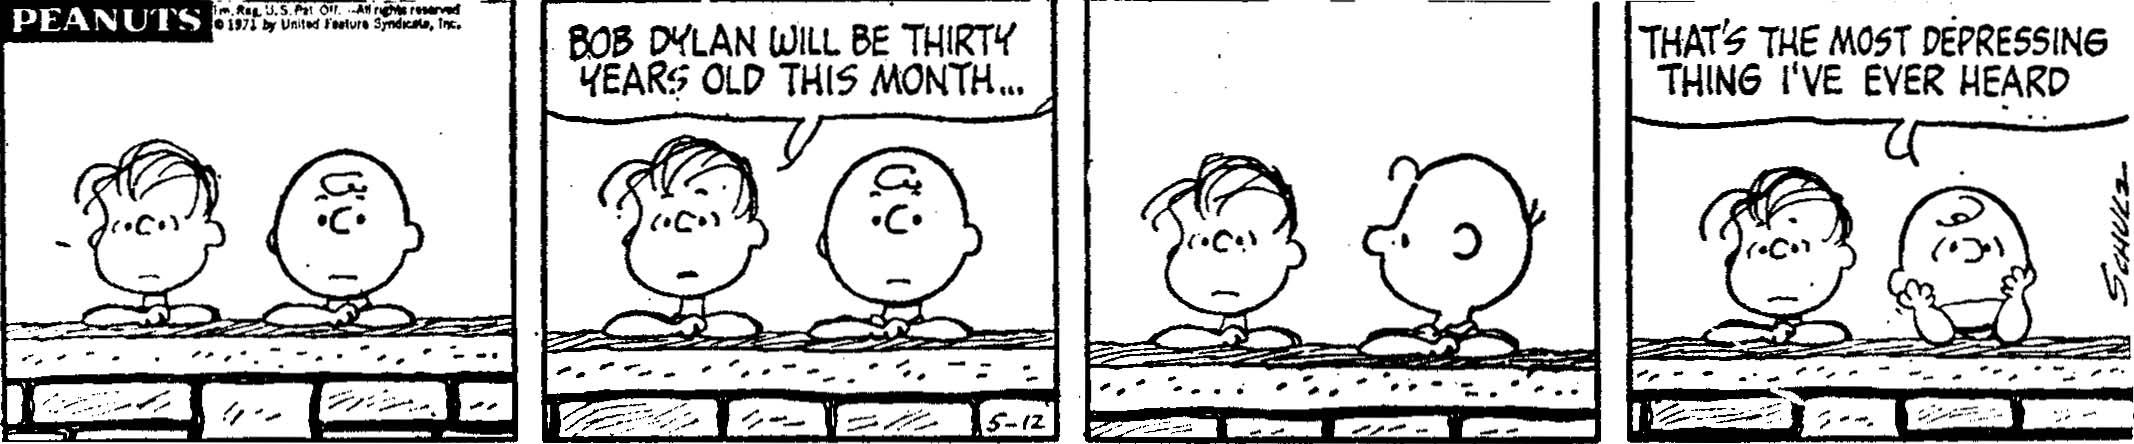 Charles M. Schulz, Peanuts, May 1971